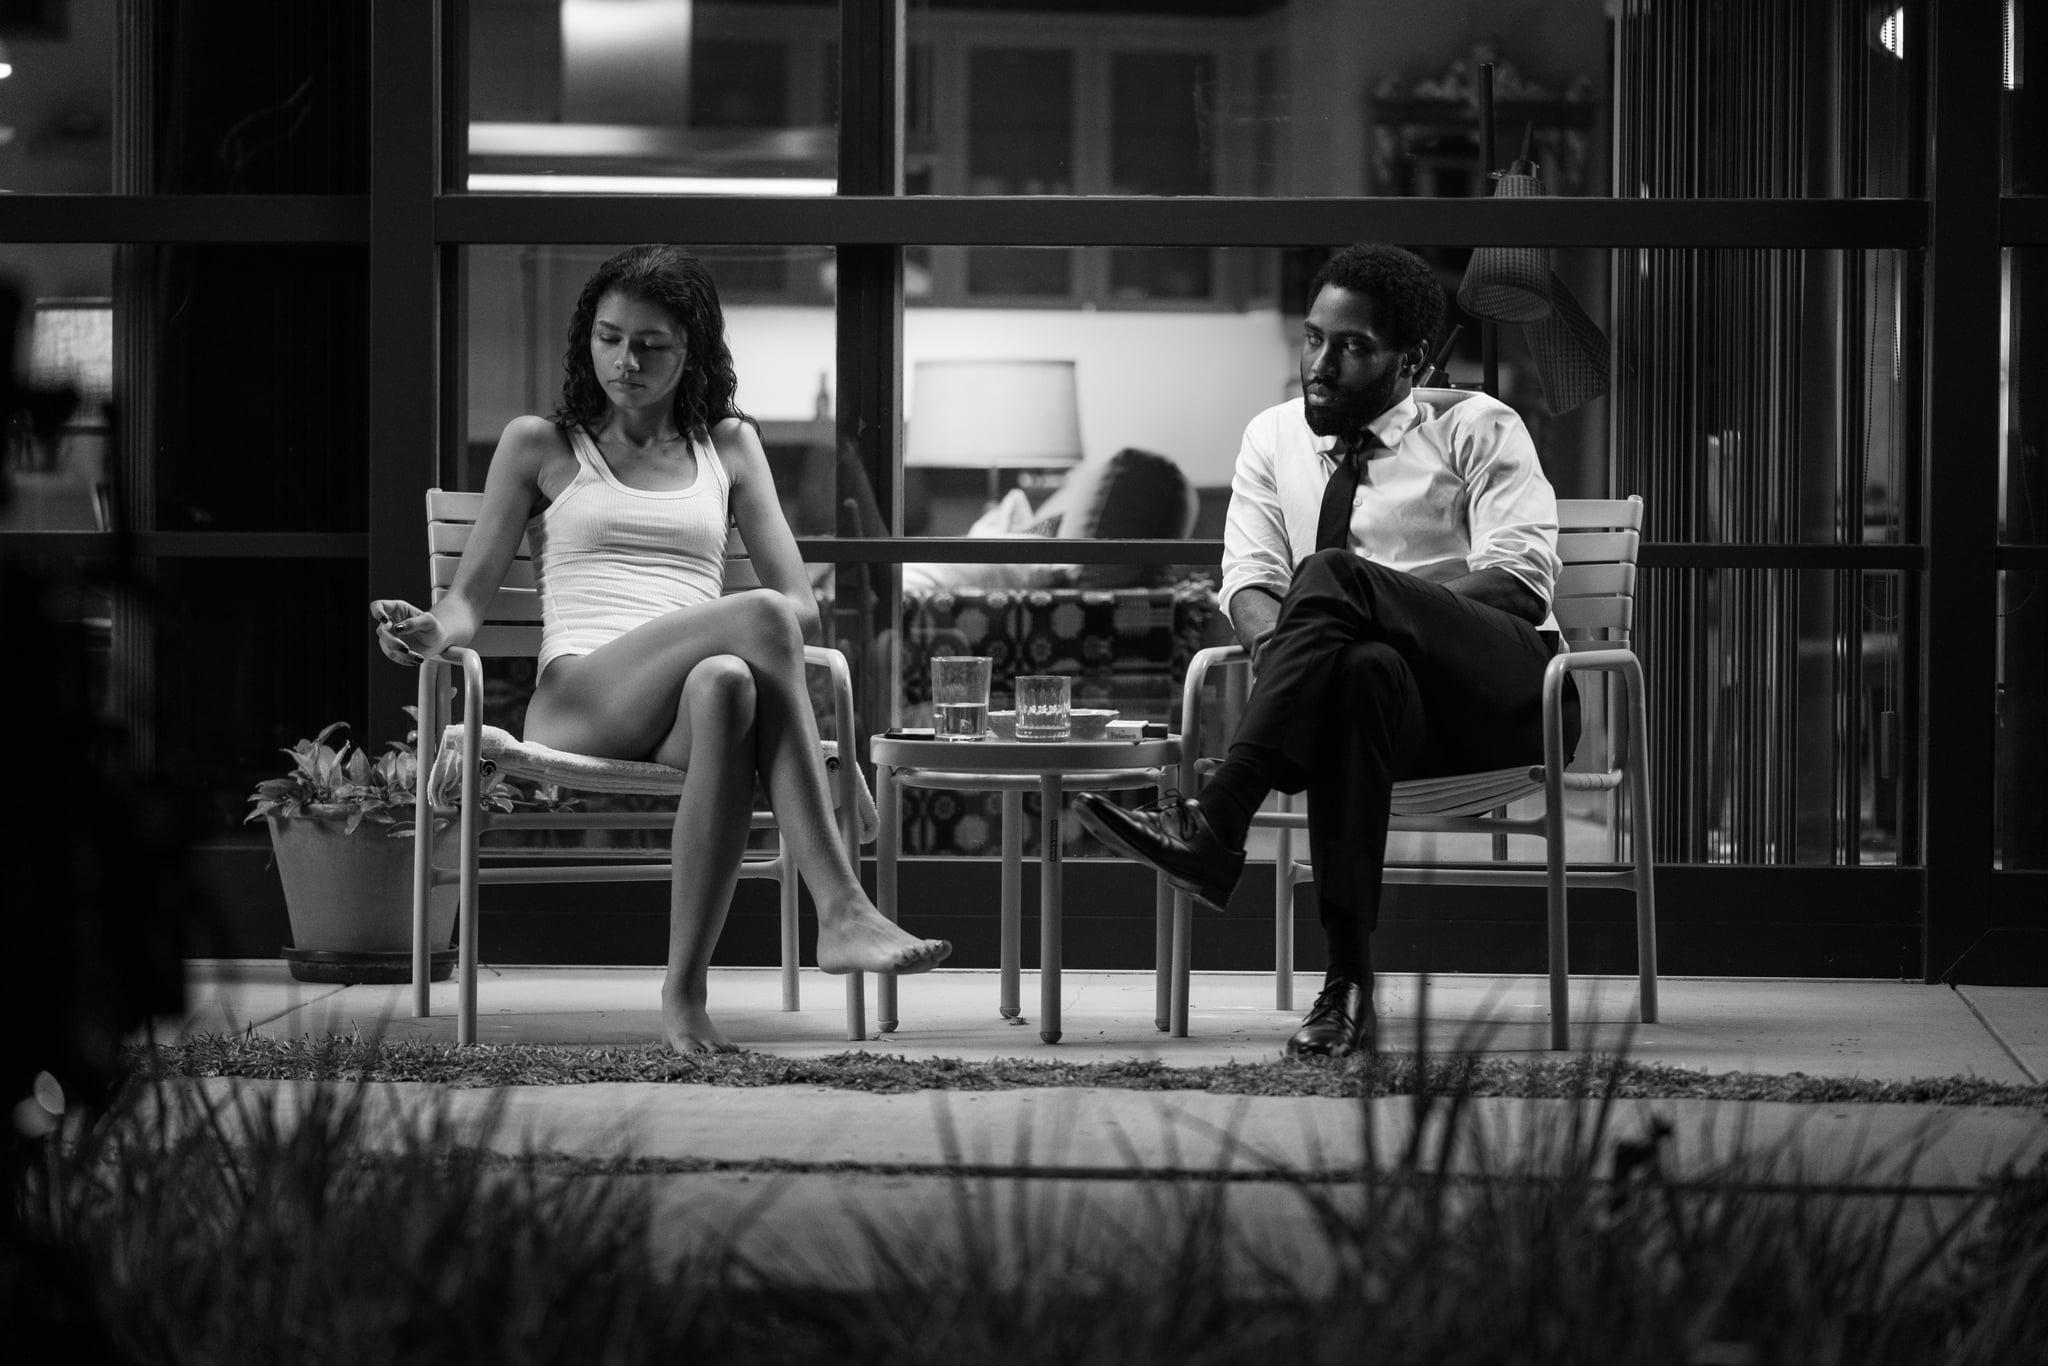 MALCOLM & MARIE (L-R): ZENDAYA as MARIE, JOHN DAVID WASHINGTON as MALCOLM. DOMINIC MILLER/NETFLIX © 2021